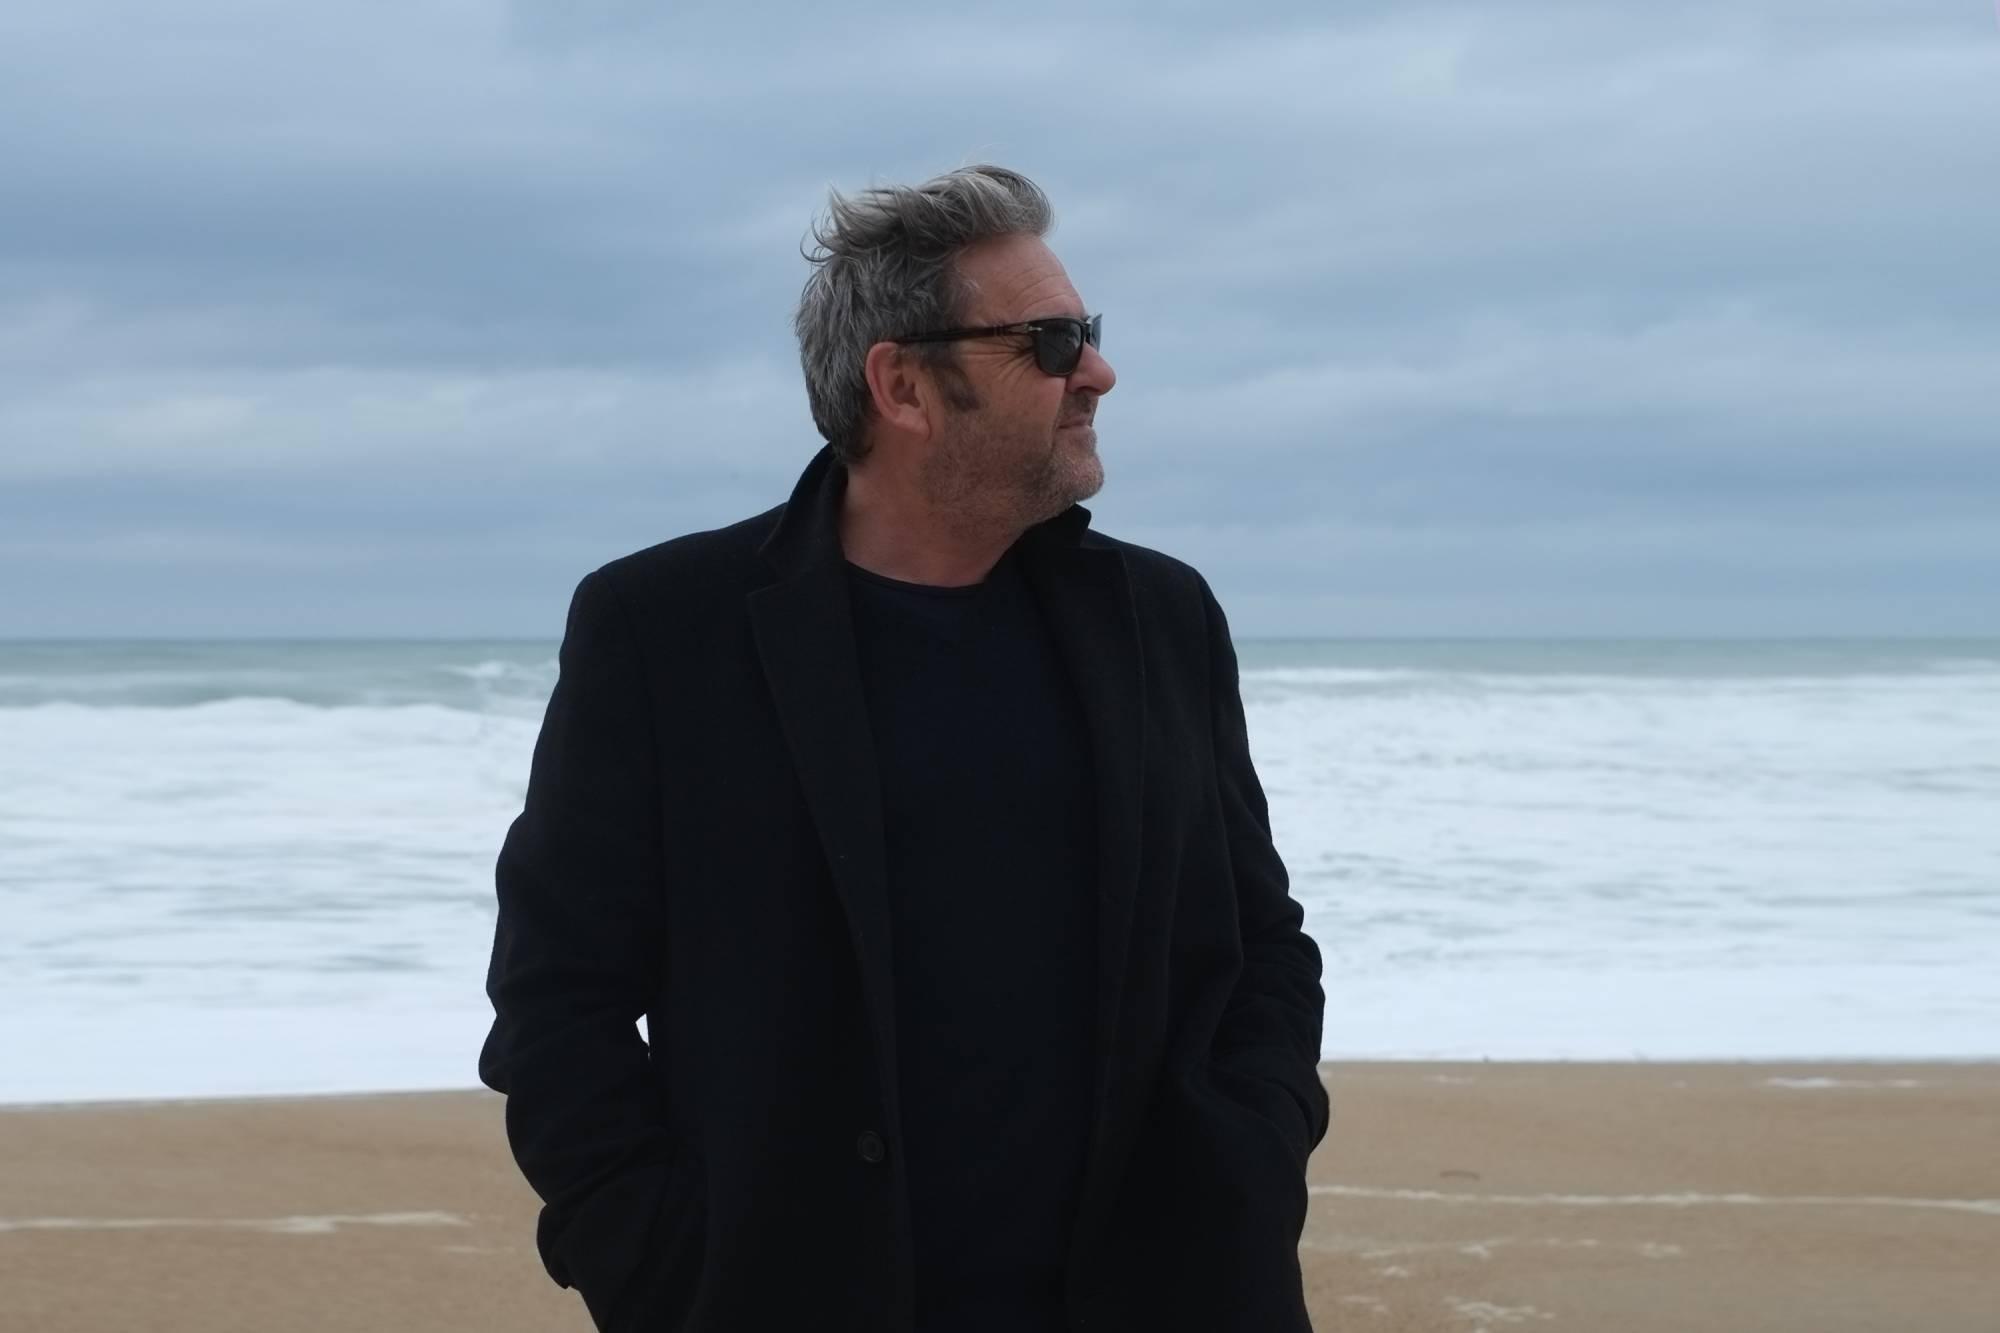 Peter Regli, Biarritz, 2018 (Image: Gregoire Prunelle)